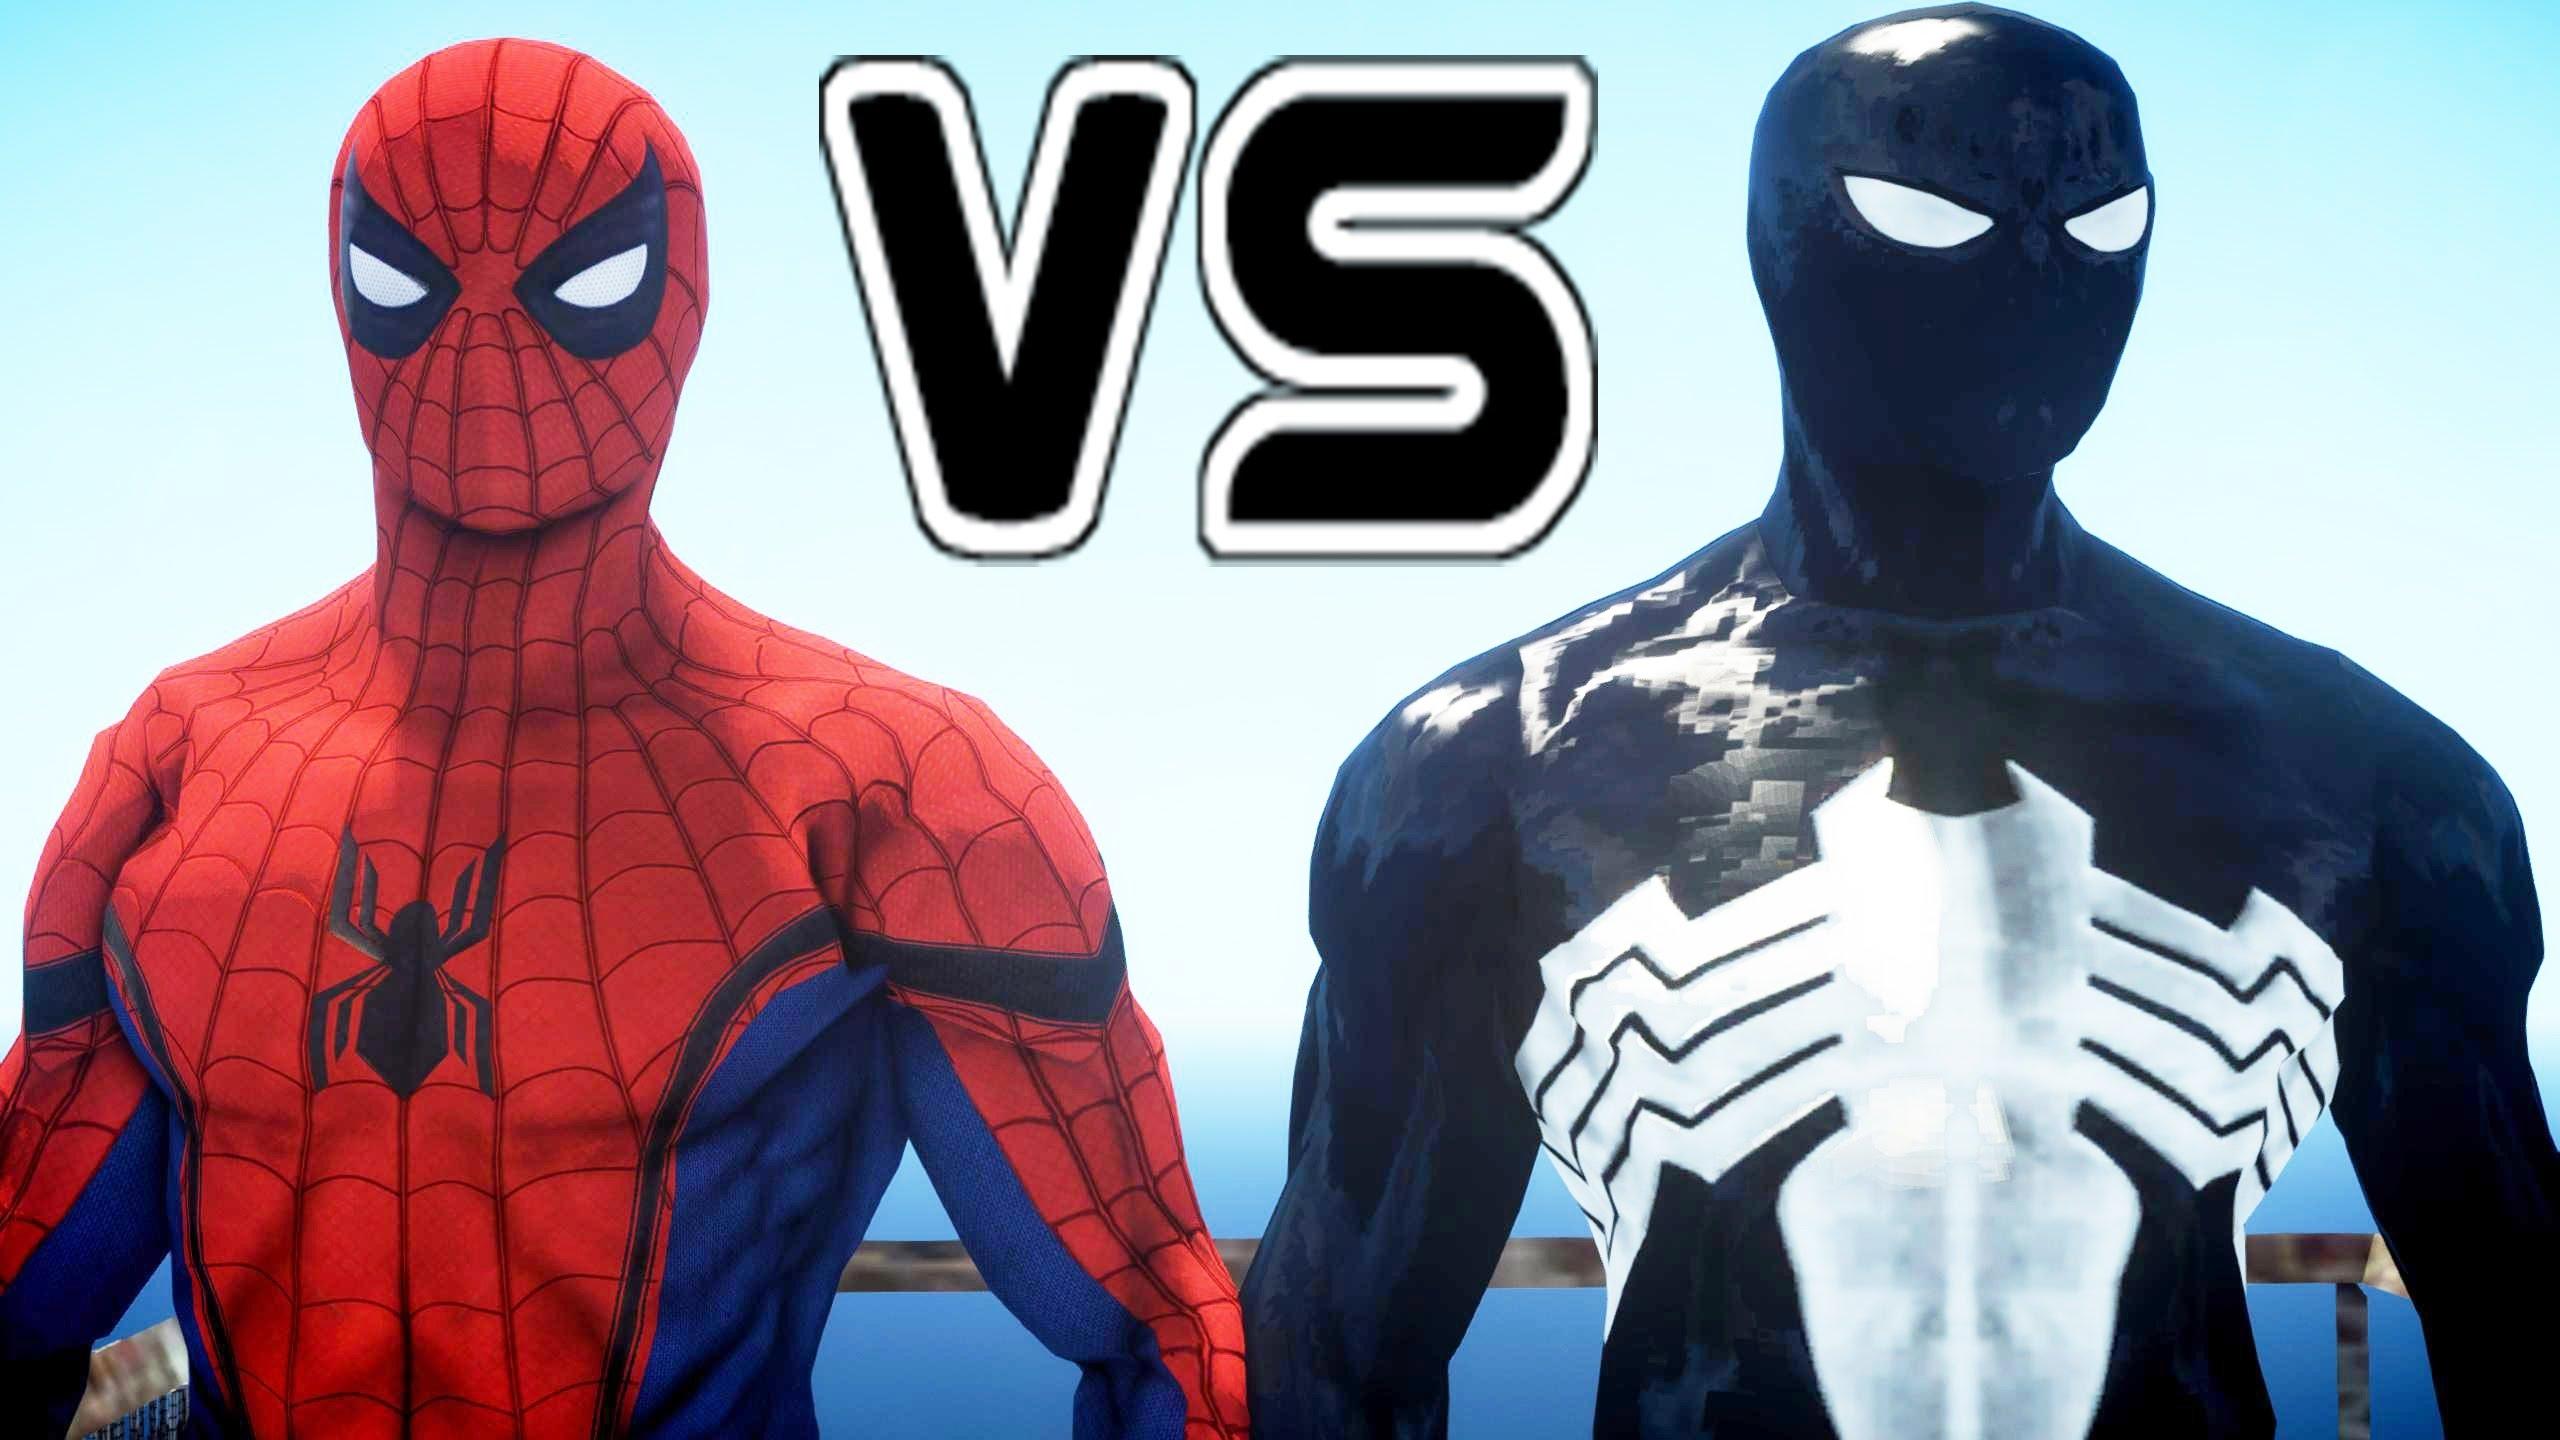 black spiderman vs spider-man (civil war) - youtube